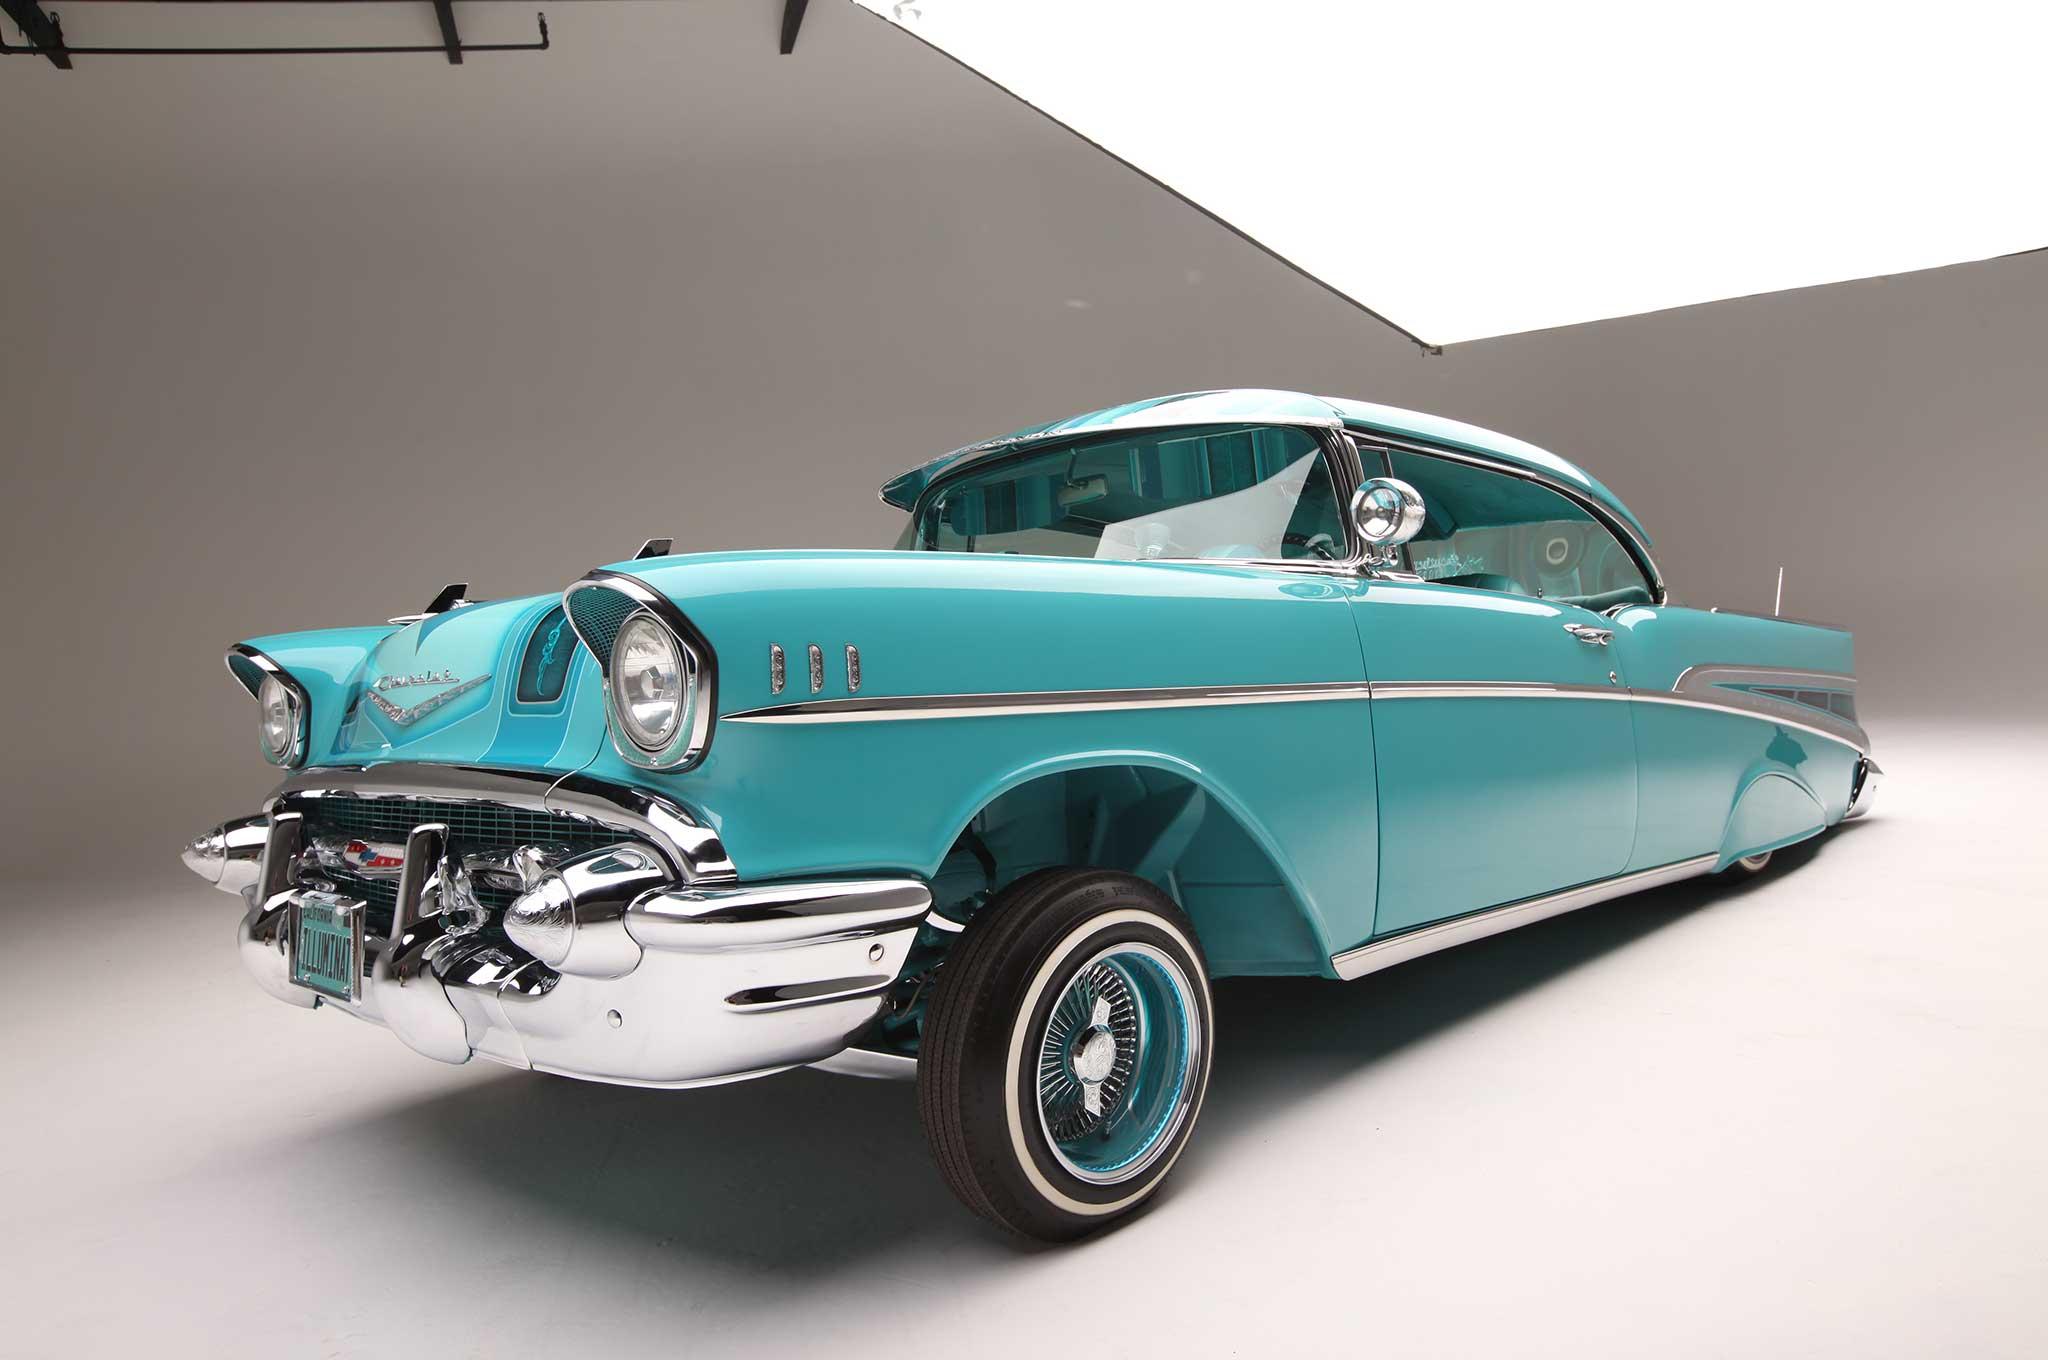 1957 Chevrolet Bel Air - Modern-Day Monarch - Lowrider